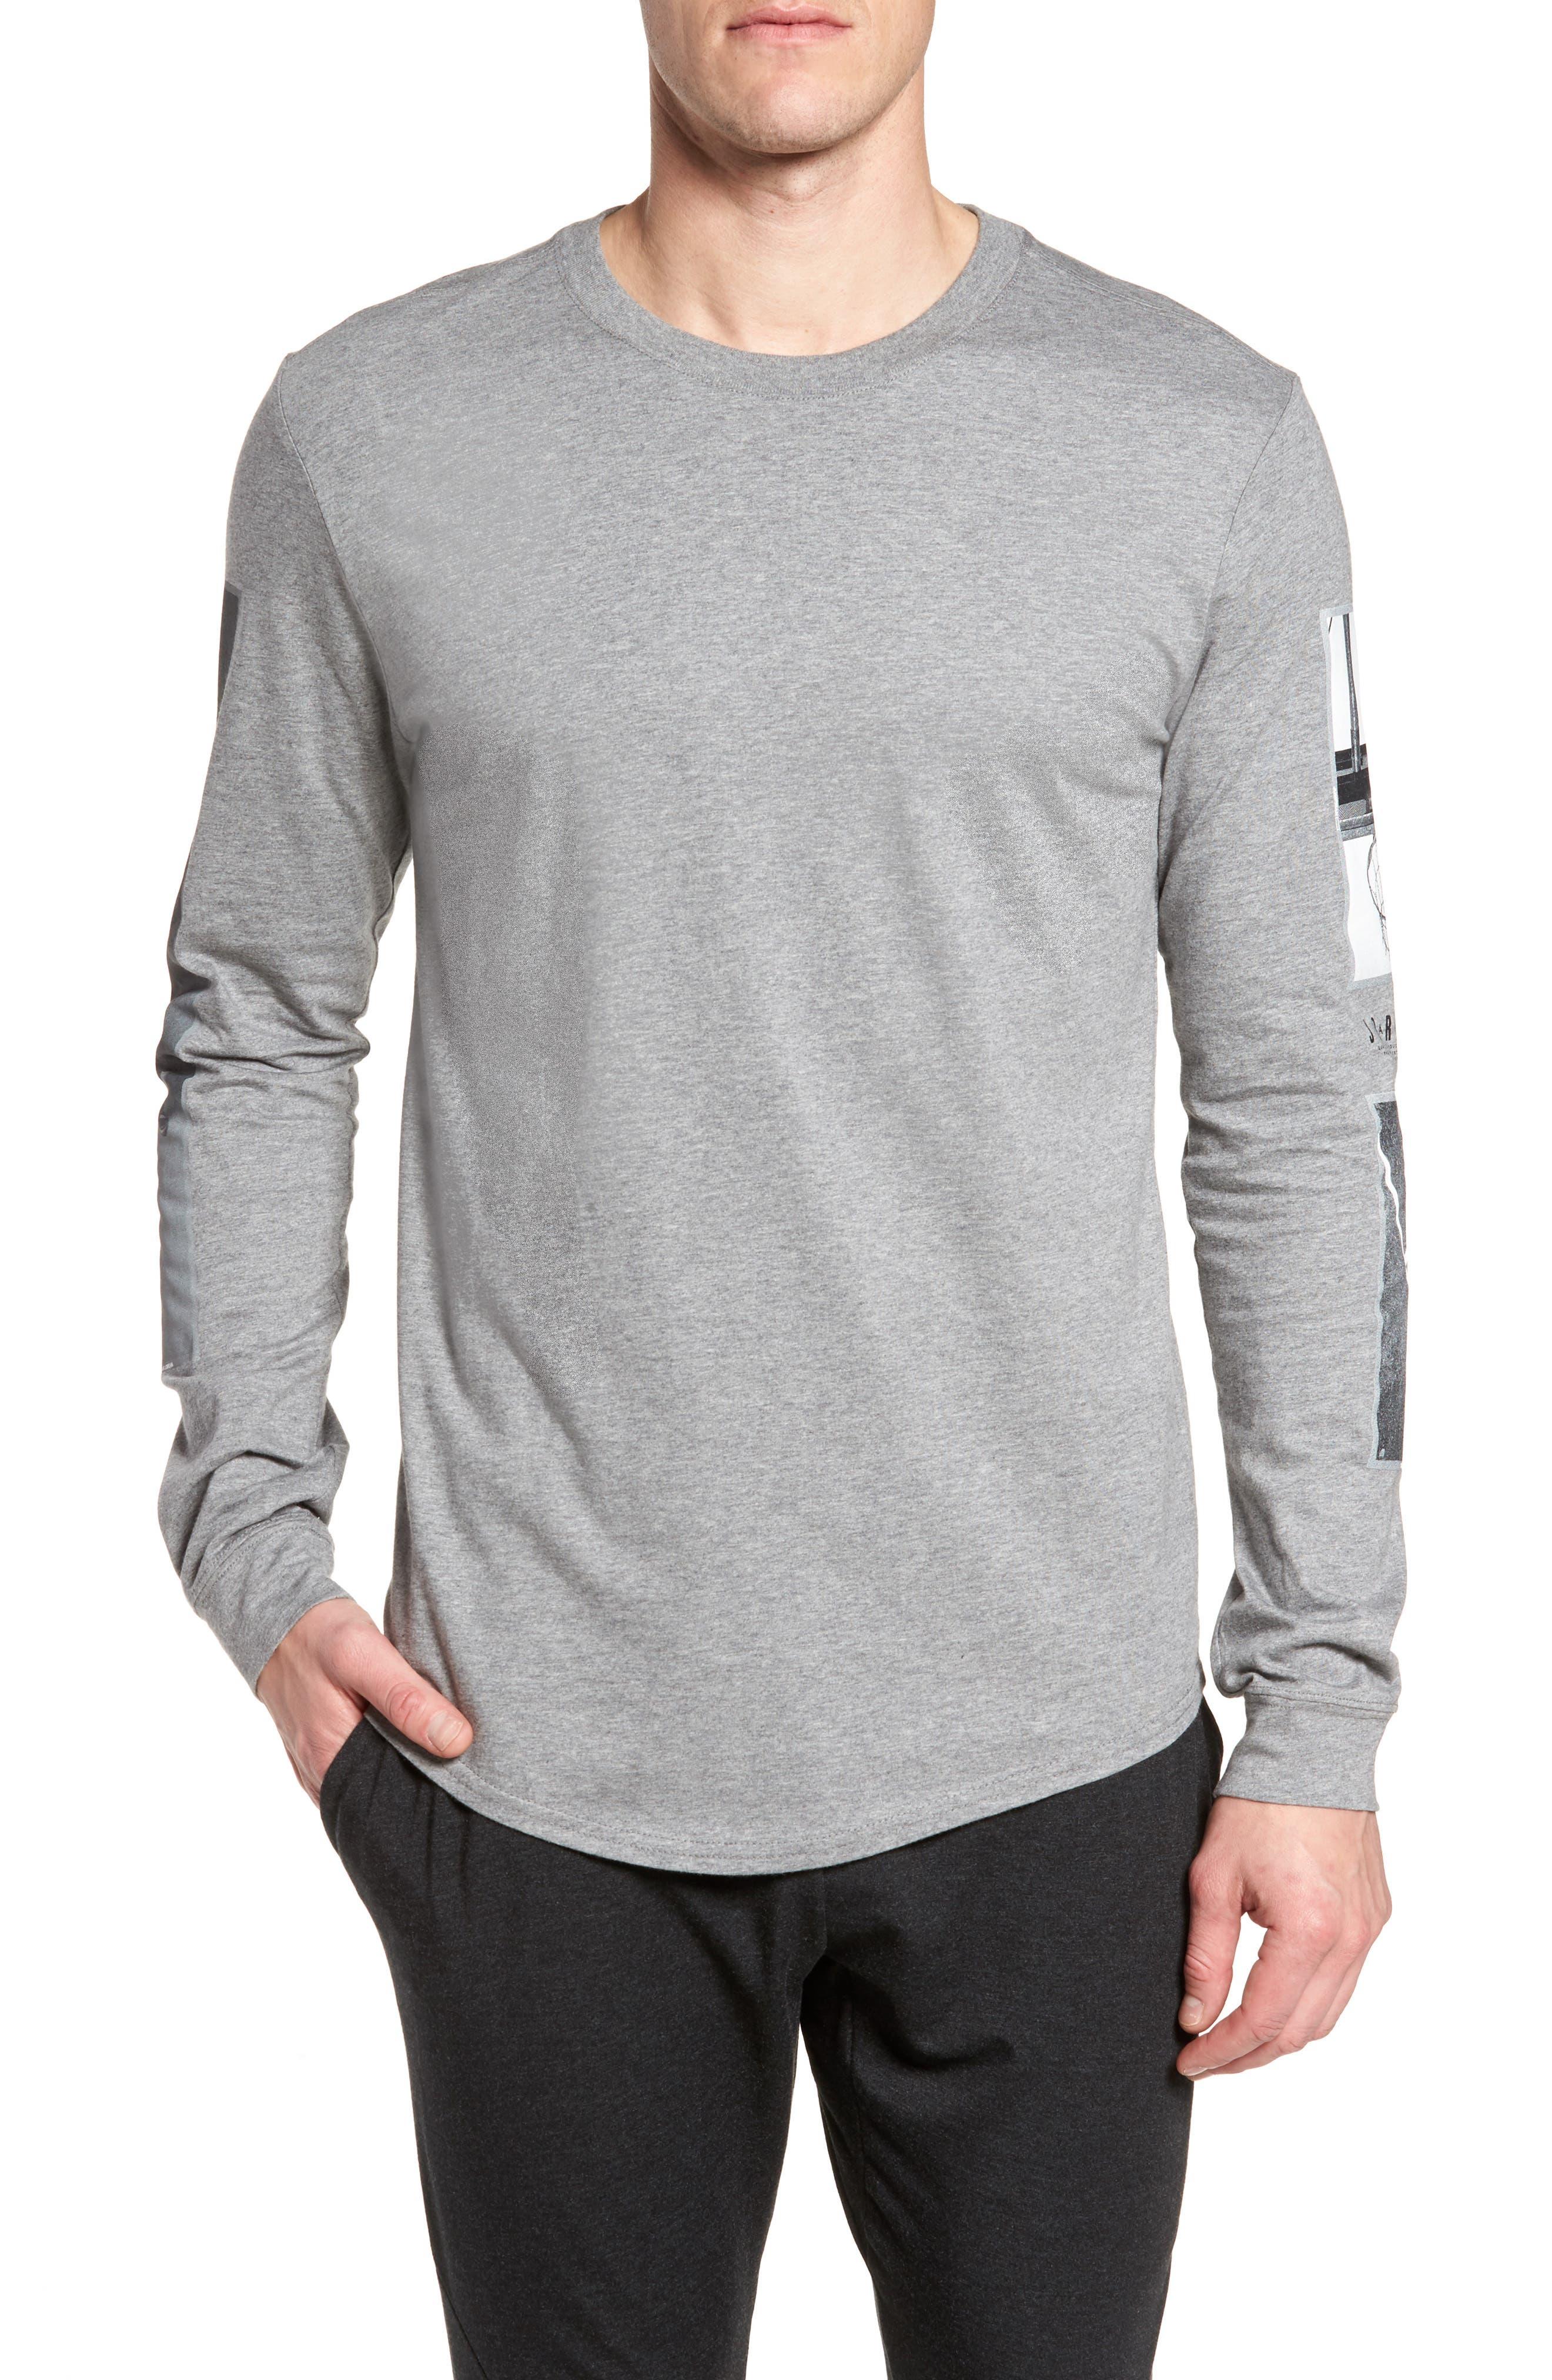 Main Image - Nike Jordan Sportswear Photo Sleeve T-Shirt